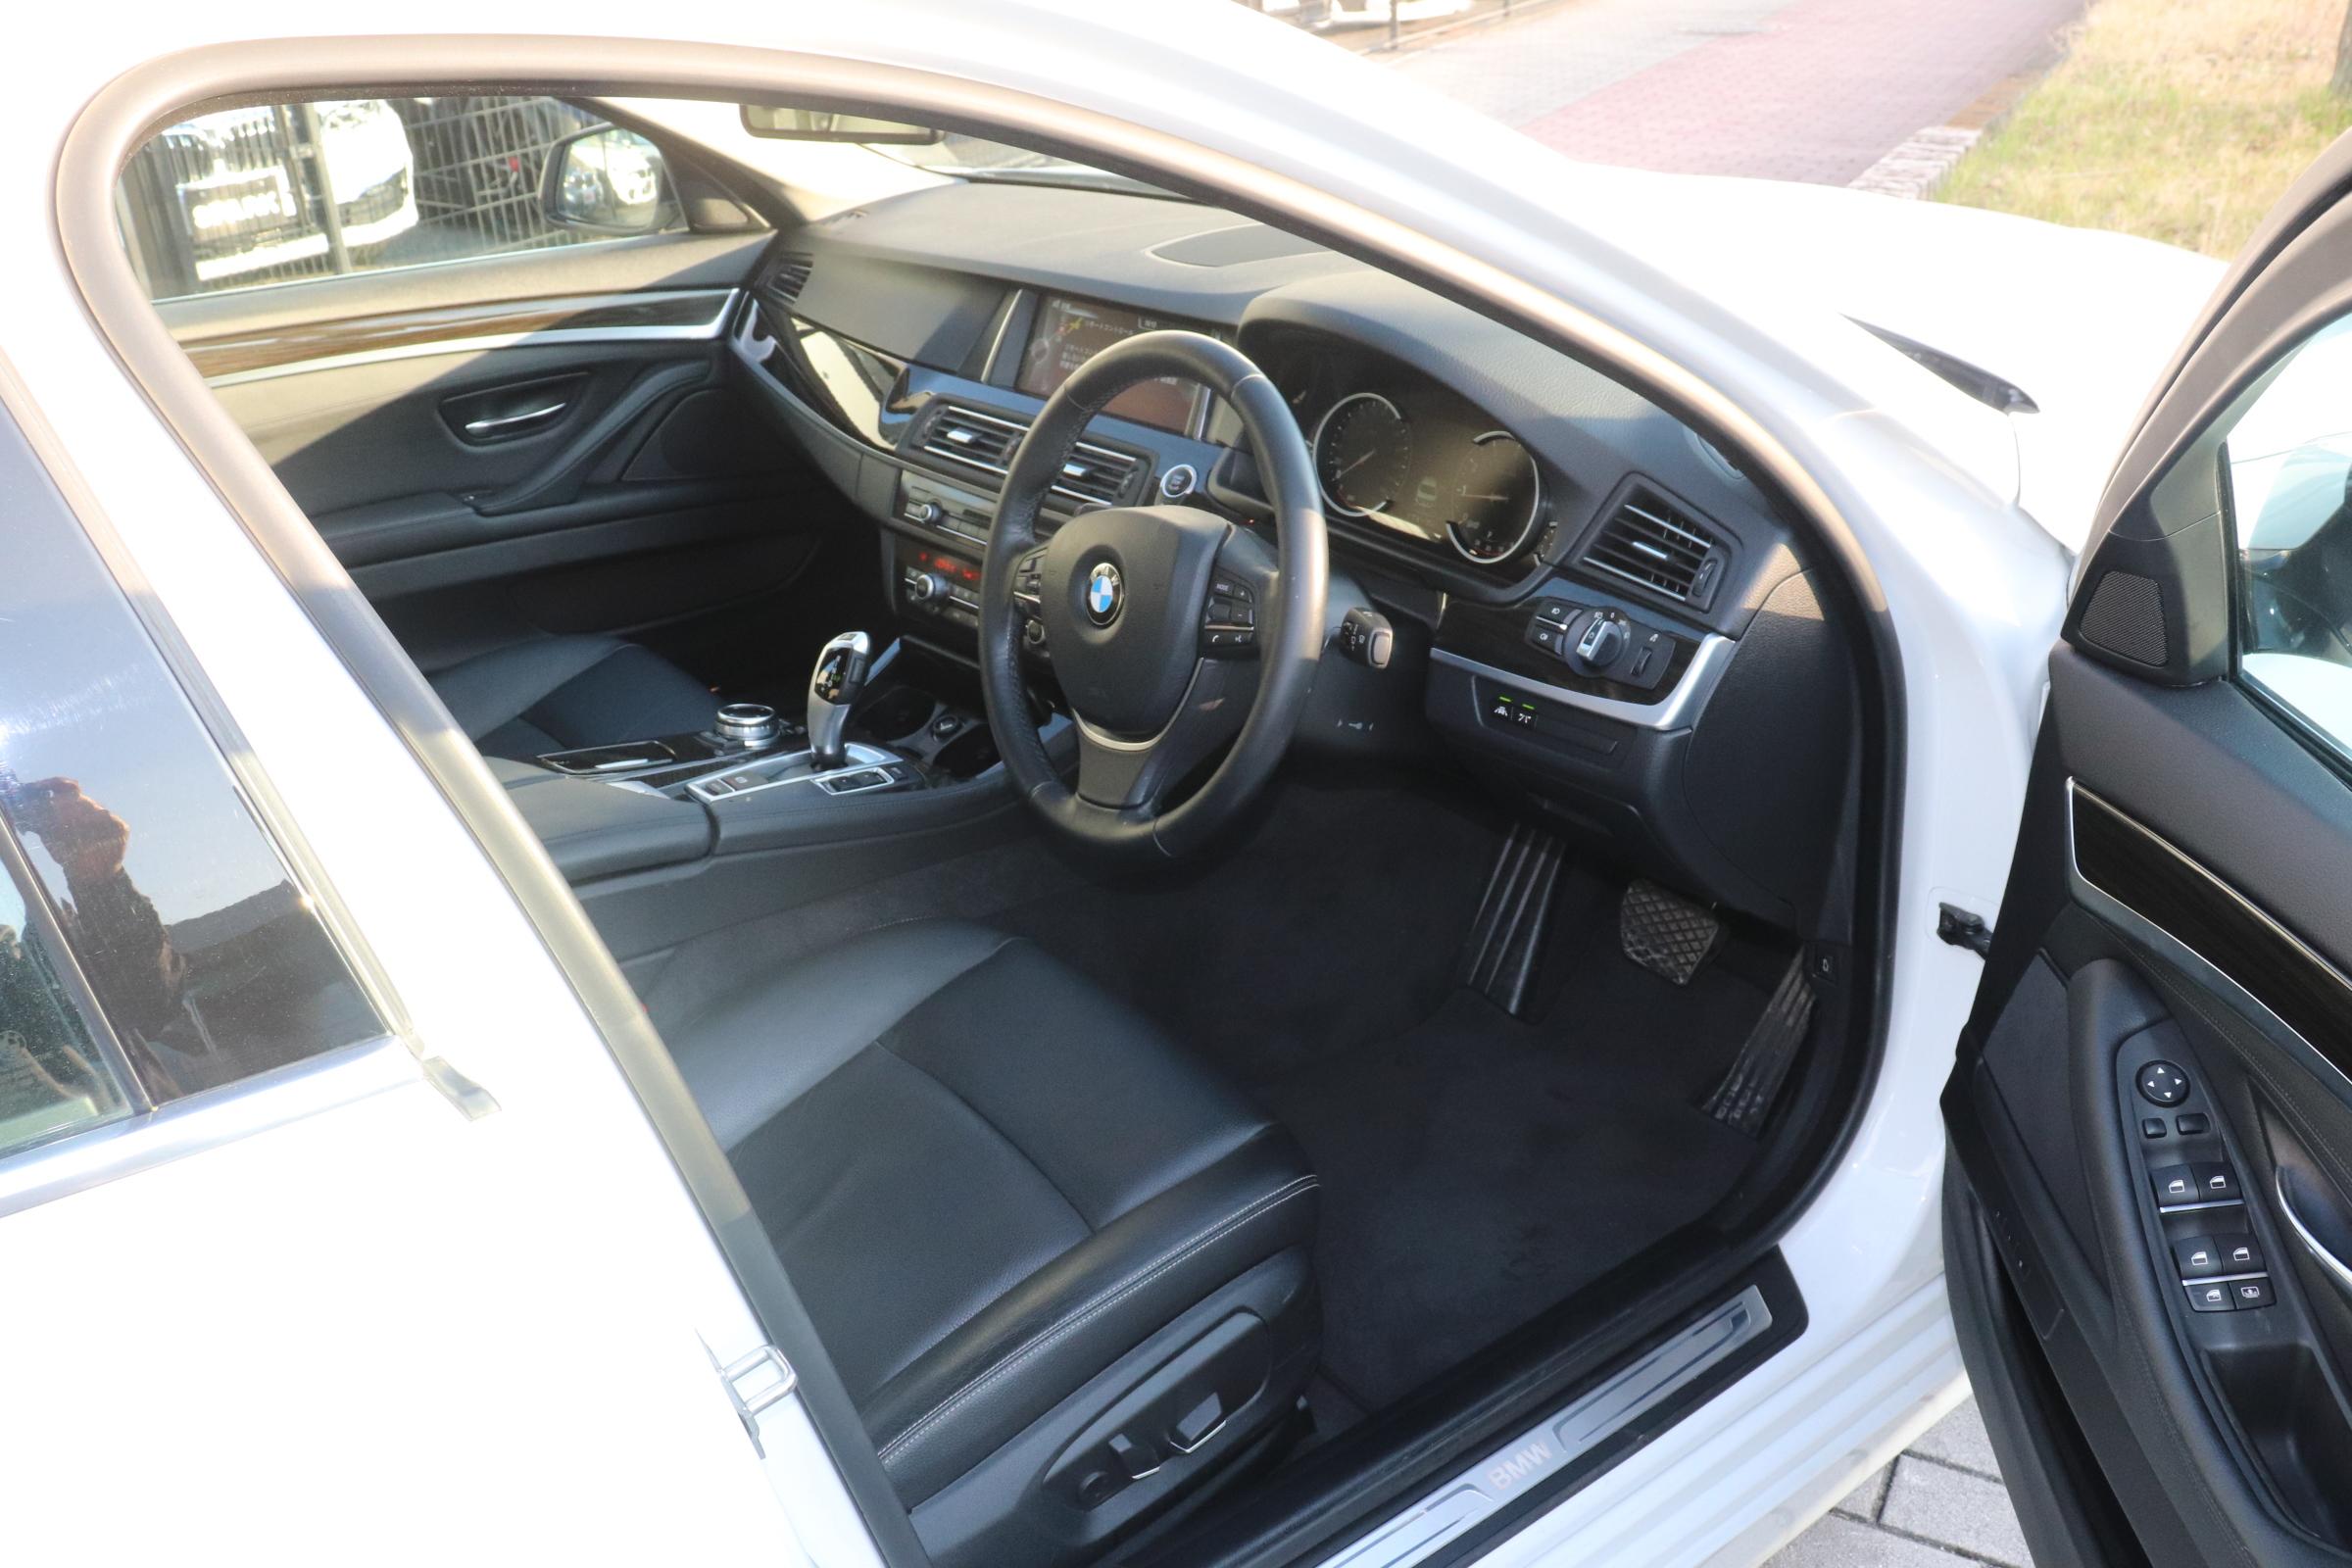 528i ラグジュアリー BEAMコンプリートカー ブラックレザーシート 2000ccターボ車両画像09